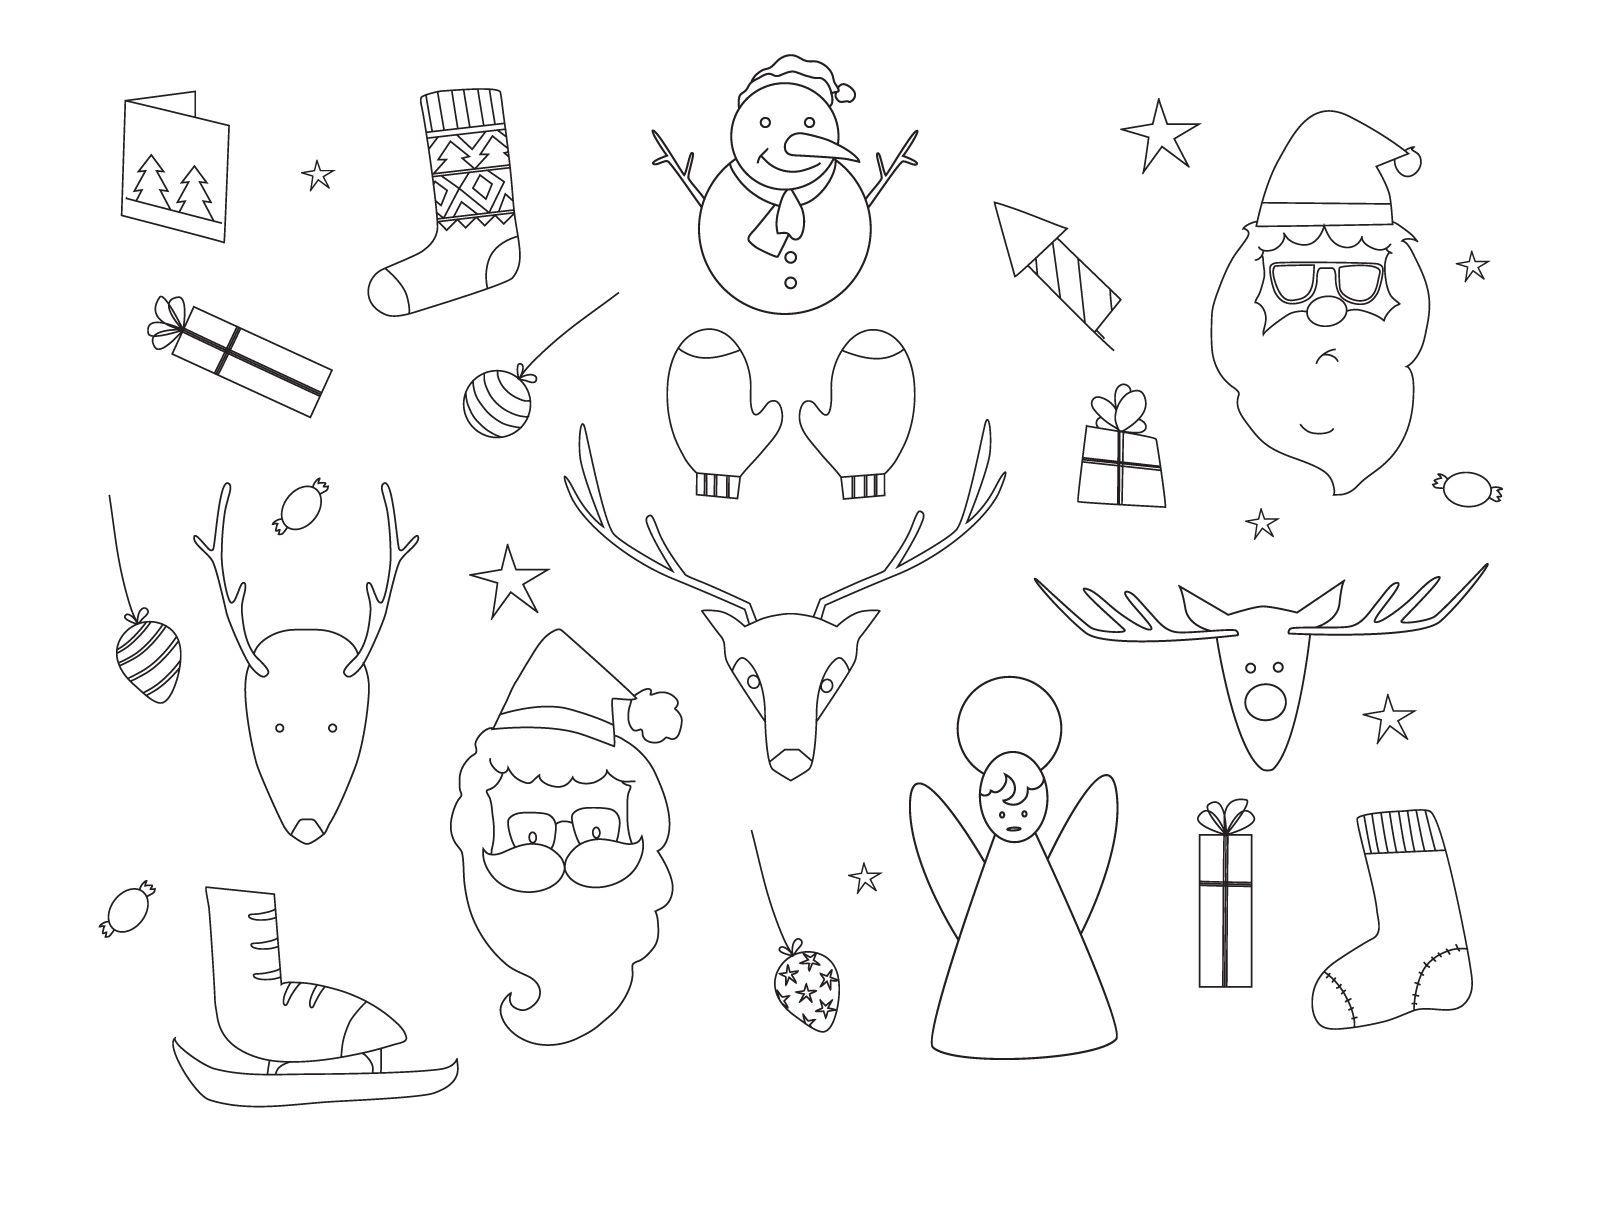 Conjunto de contorno de elementos navide?os dibujados a mano